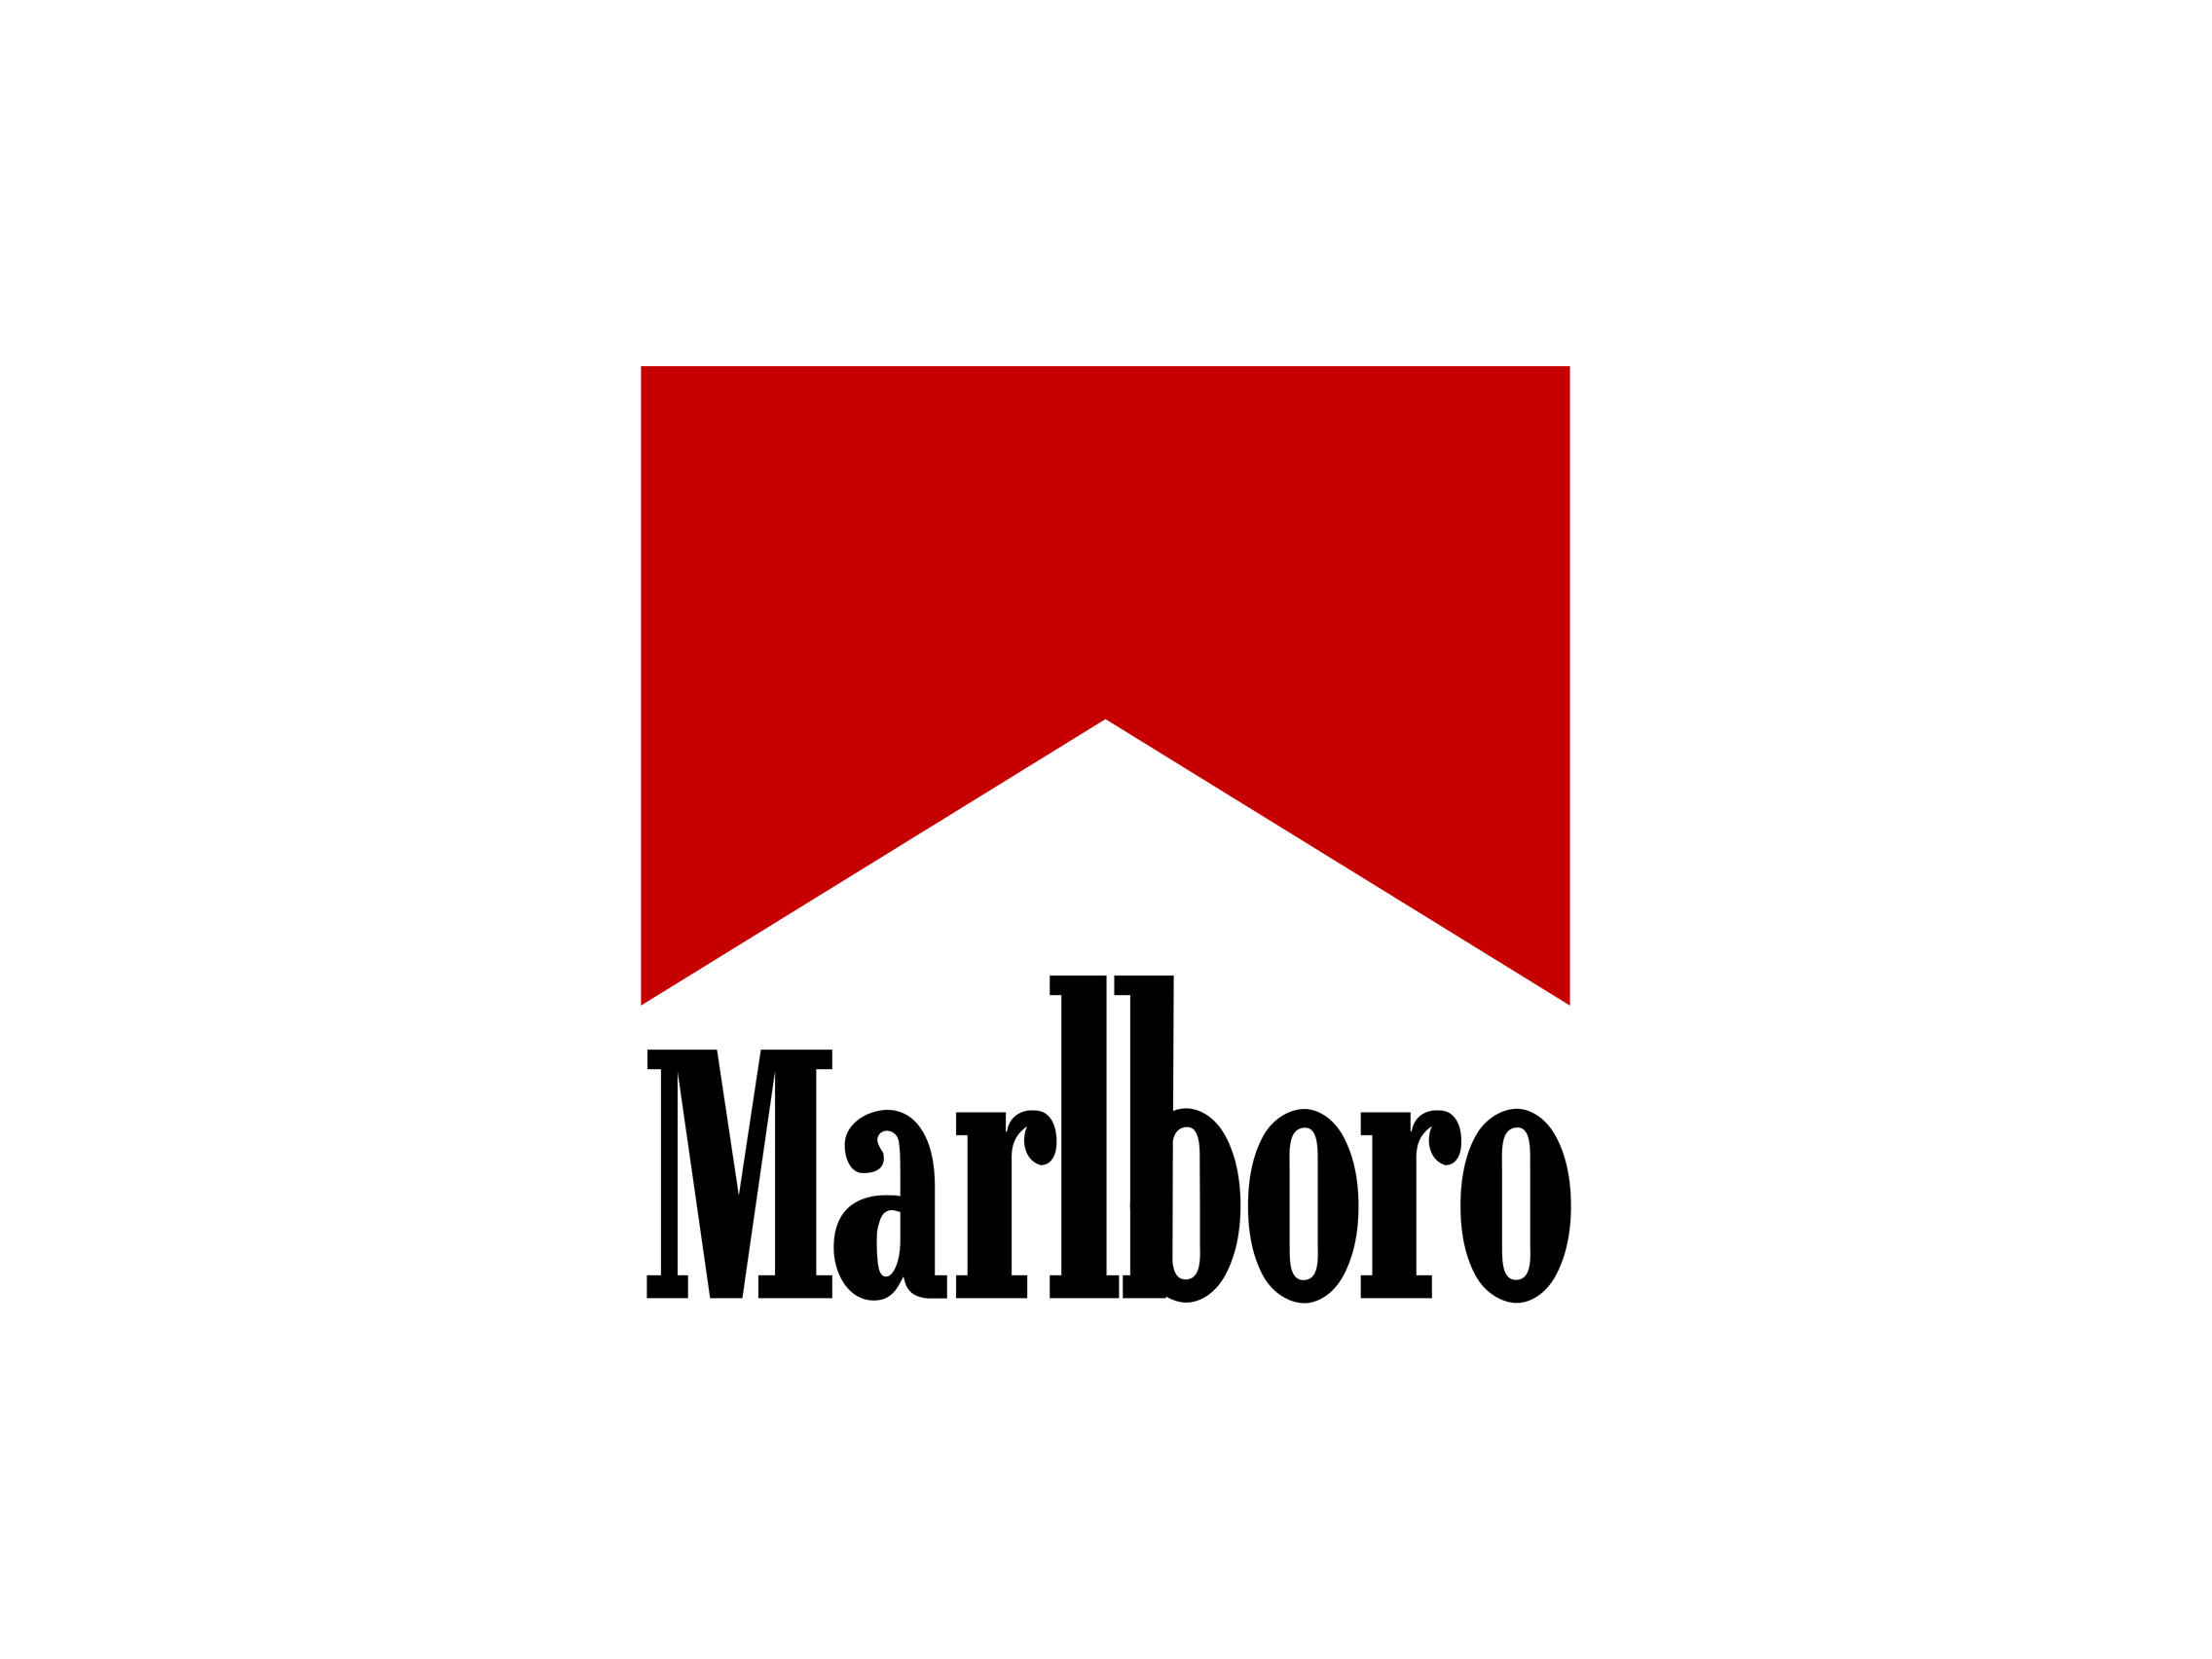 Price of Marlboro Red in Hawaii